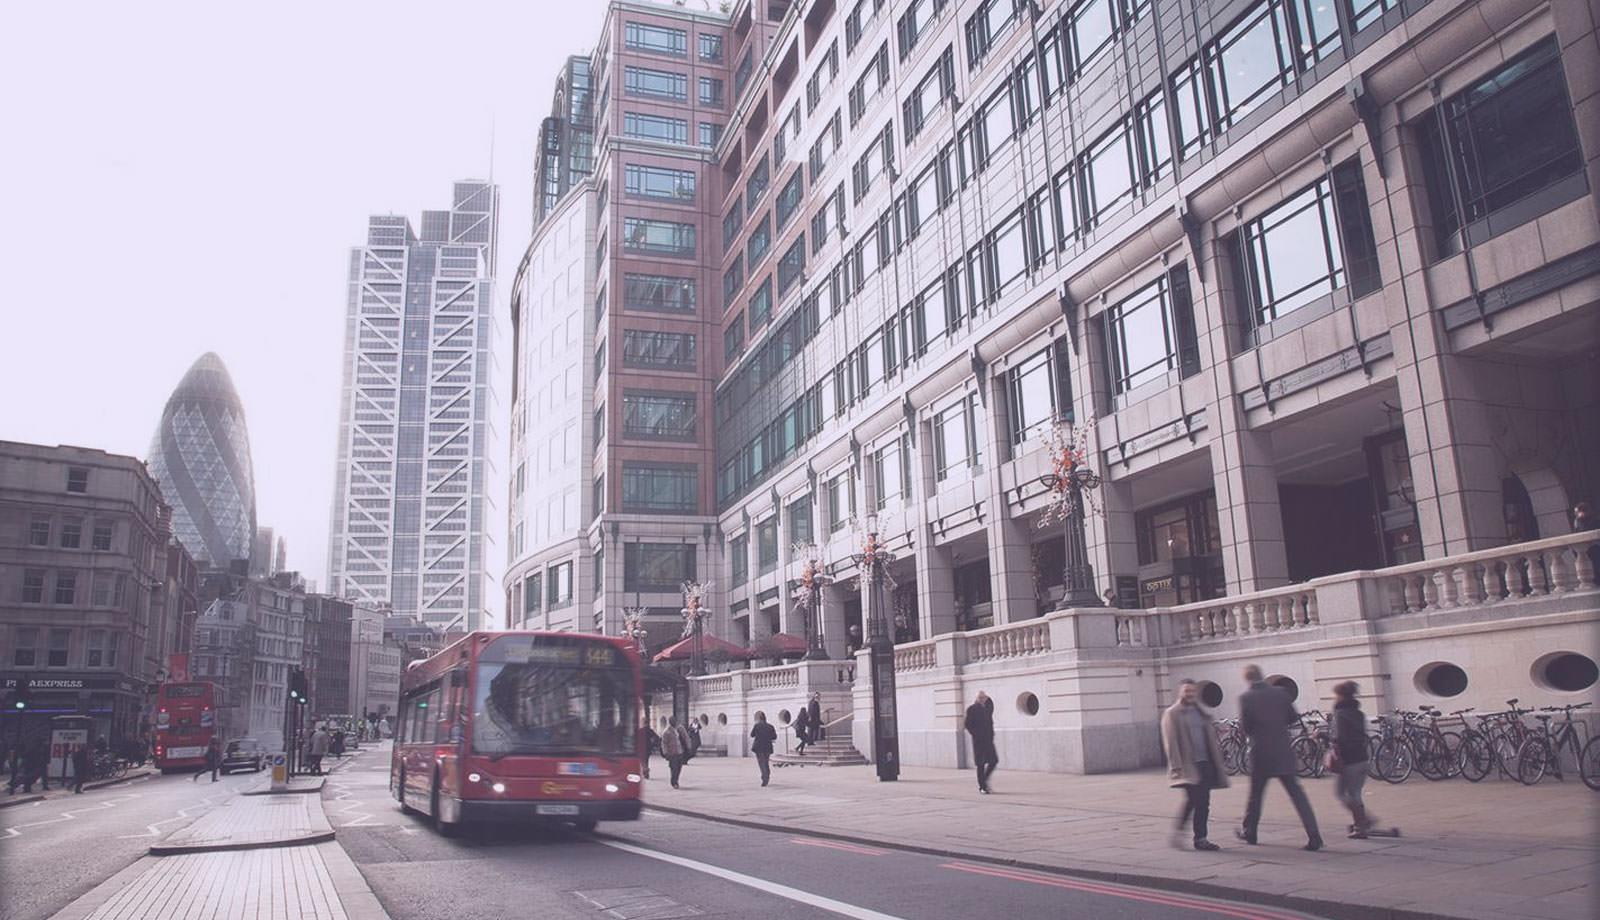 London venue